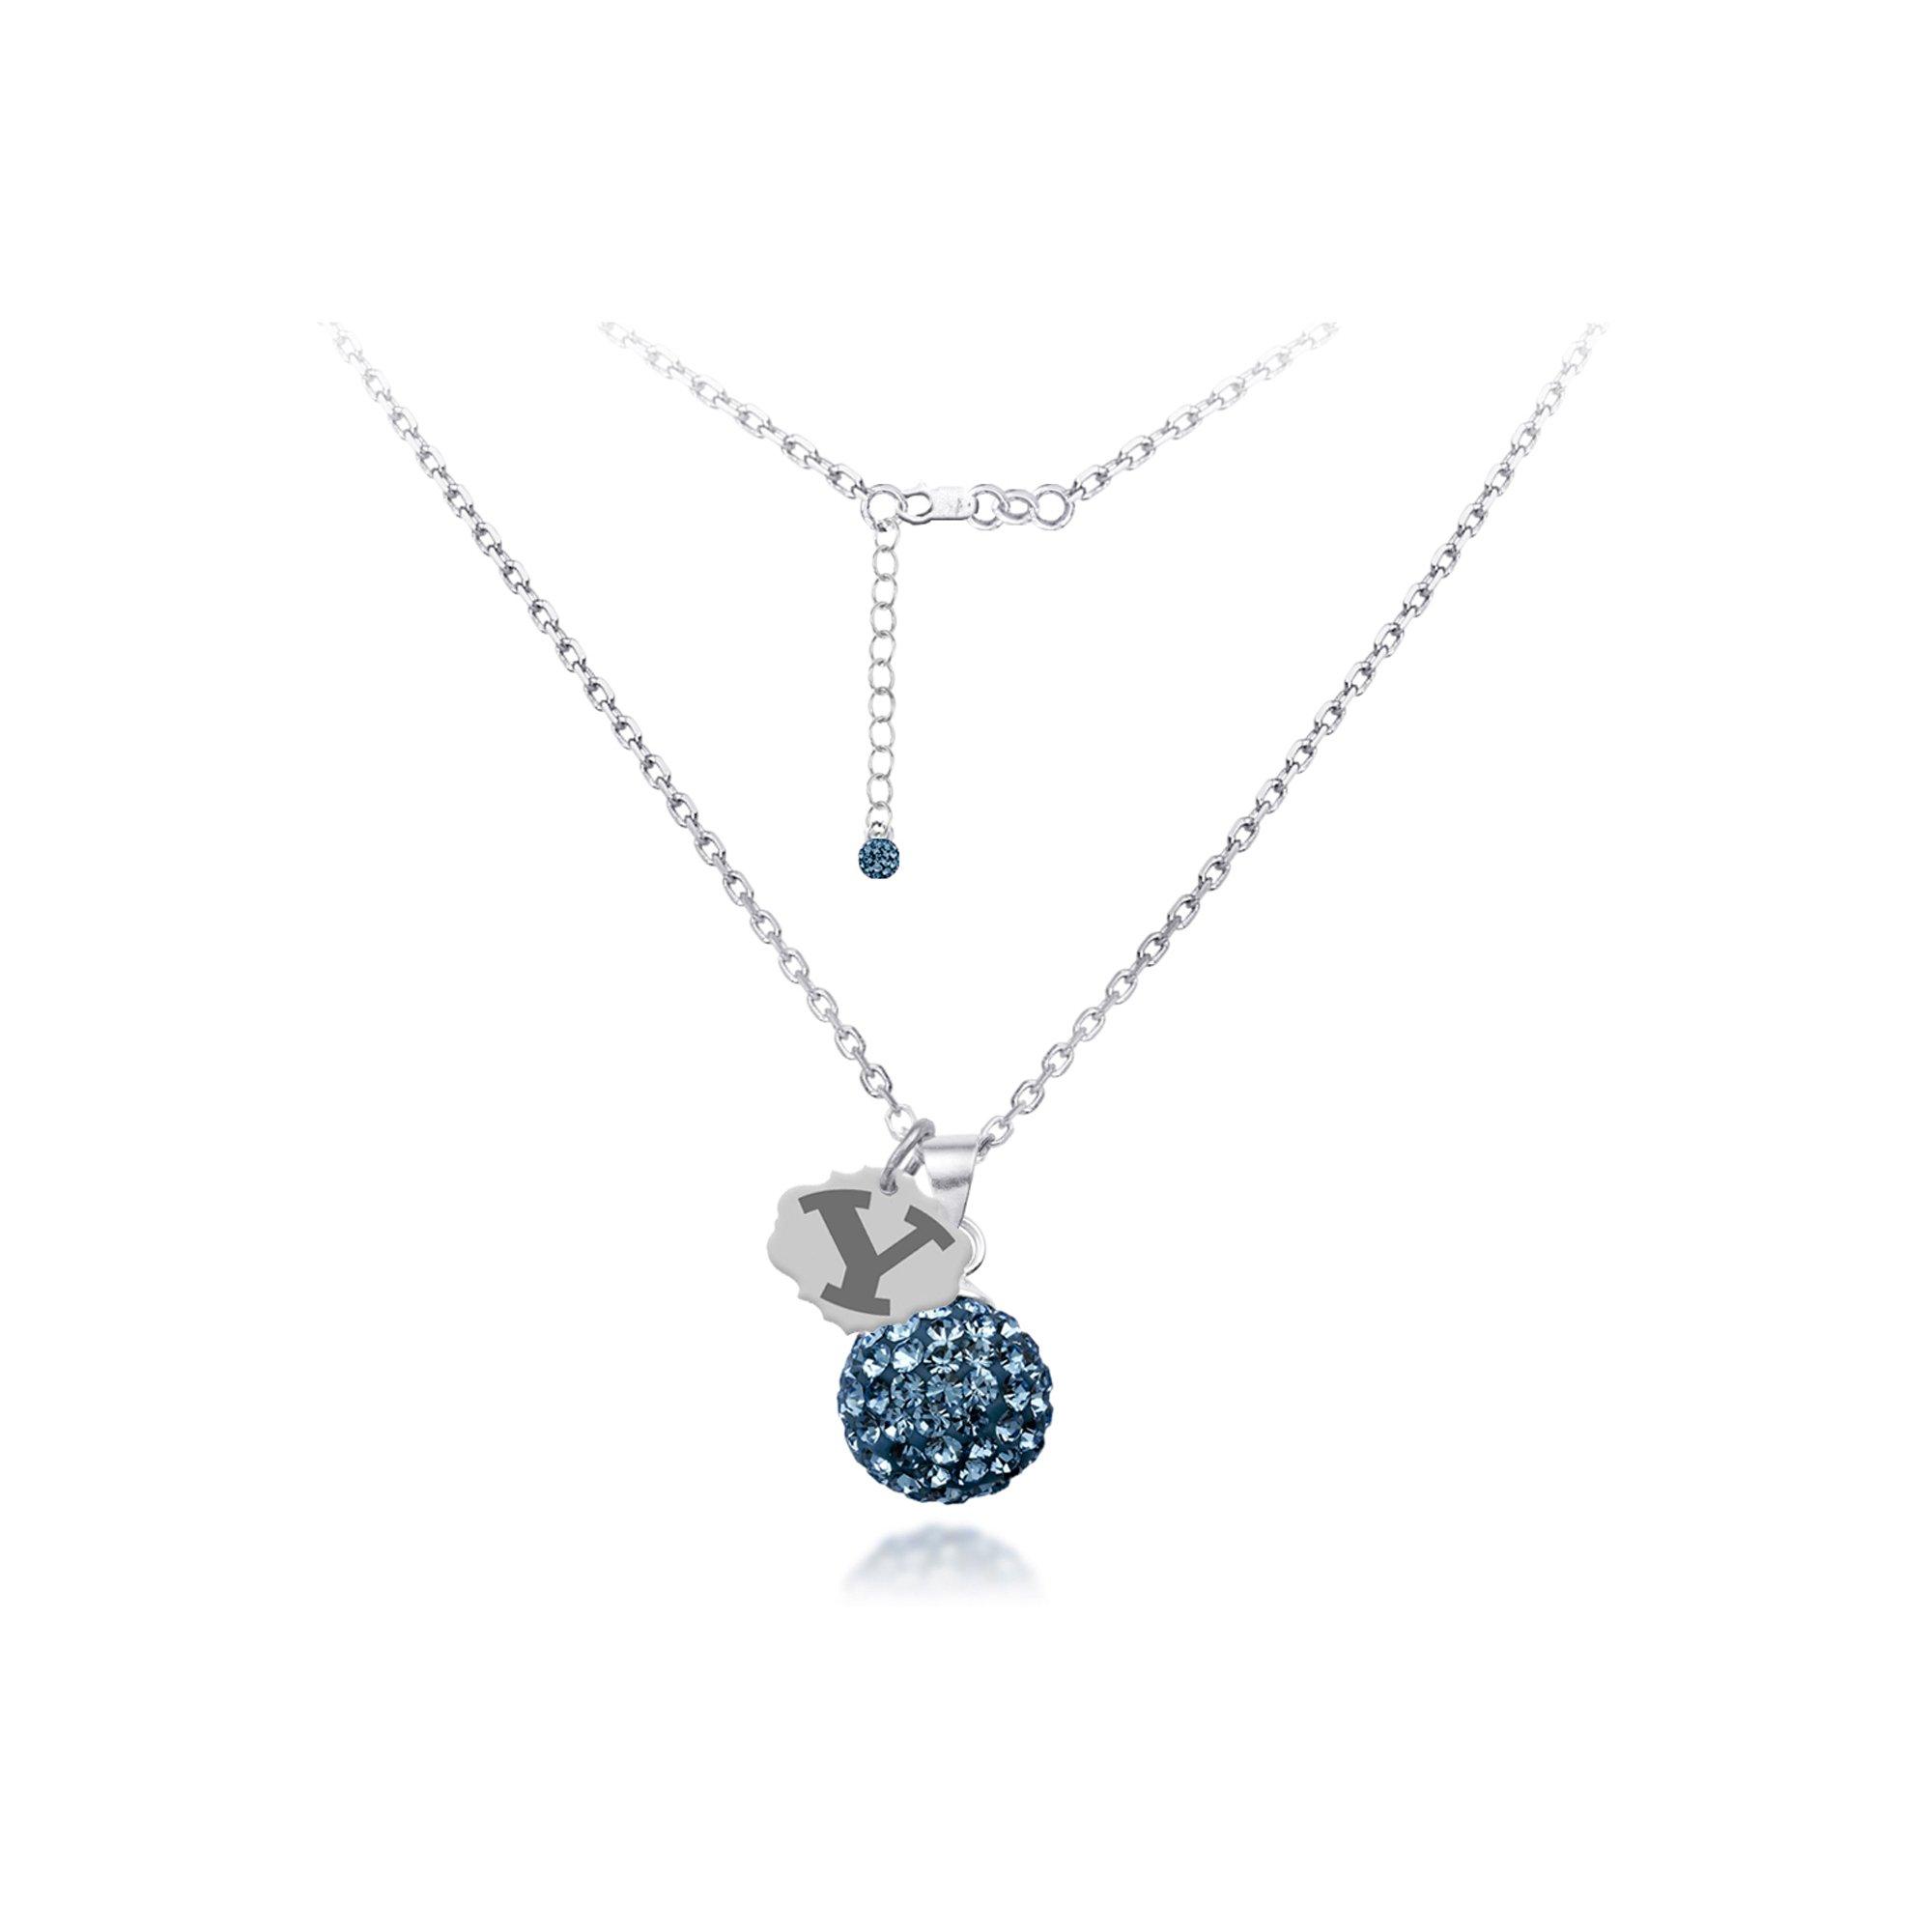 DiamondJewelryNY Silver Pendant, Spirit Sphere Neck/Brigham Young Univ